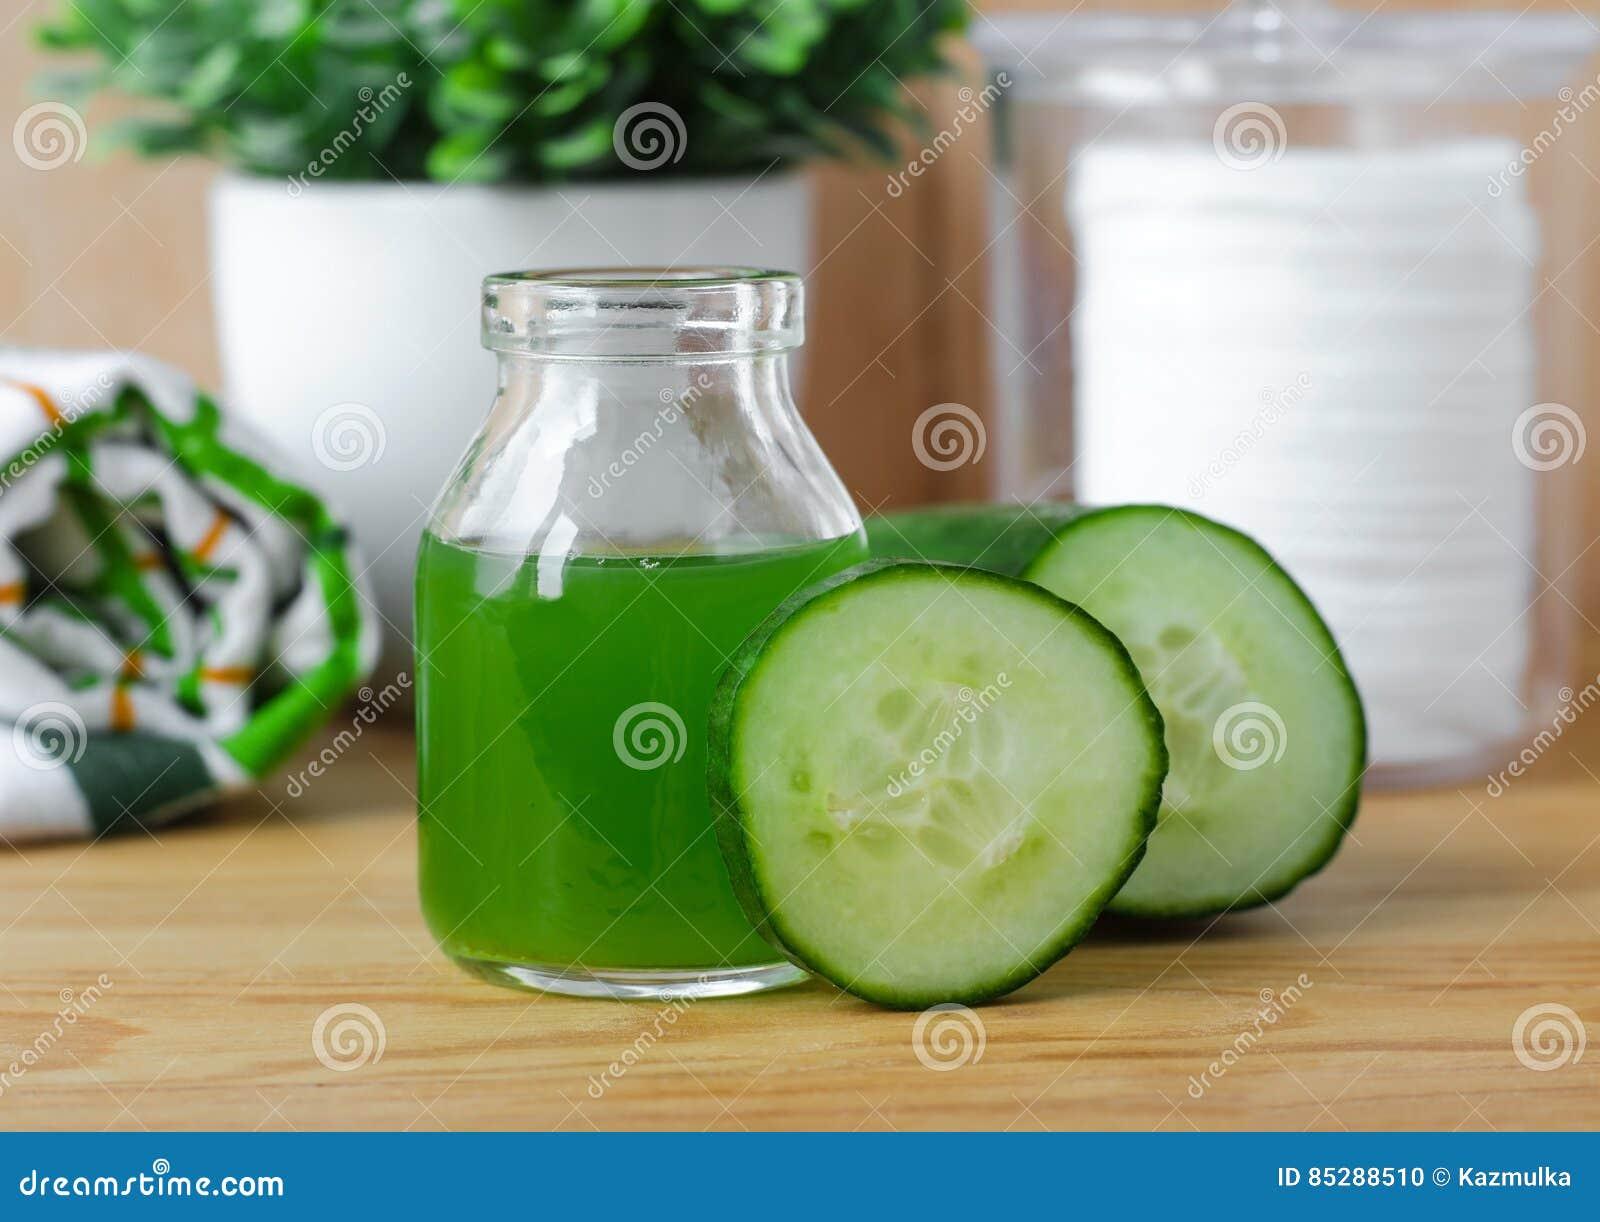 Cucumber juice in a small glass jar for preparing natural facial toner. Homemade cosmetics.